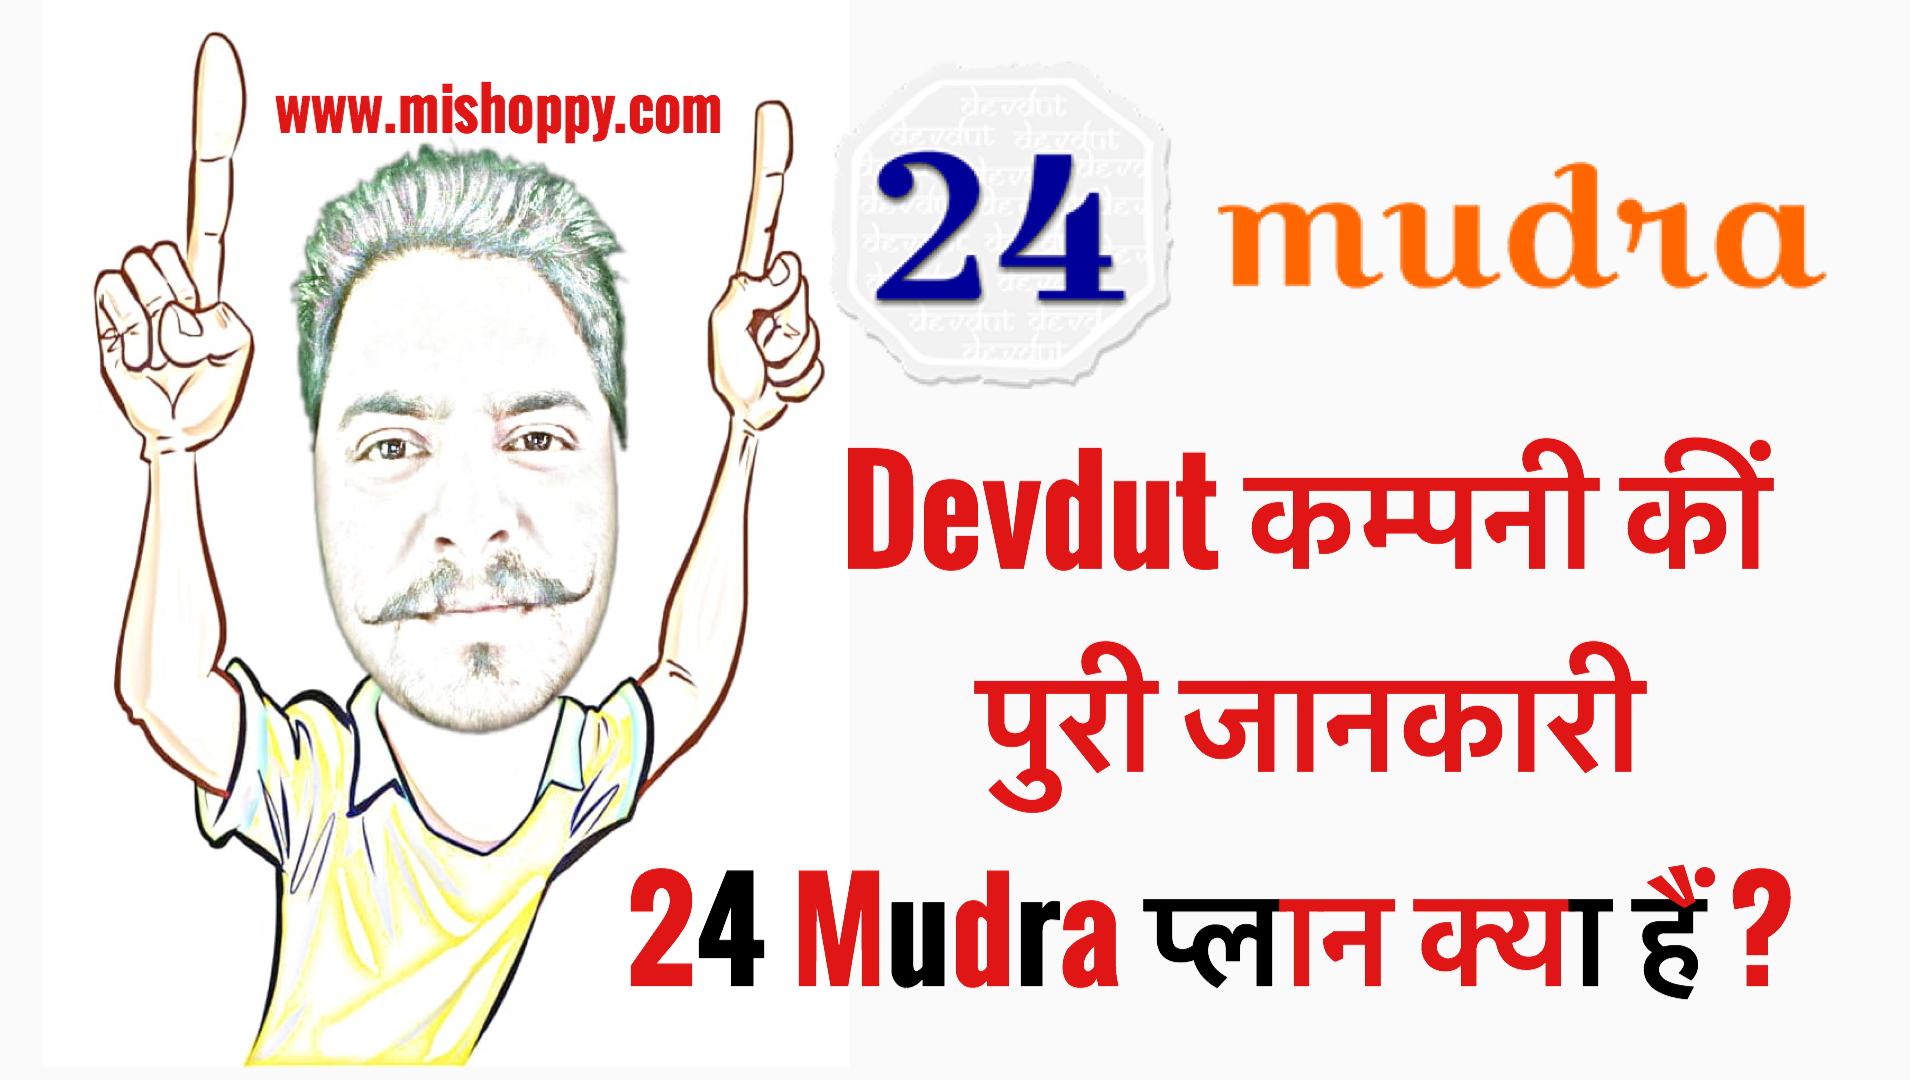 24 Mudra AutoPool Plan | 24 mudra plan | 24 mudra business plan 24 mudra plan in Hindi | 24 Mudra Plan kya hai | 24 mudra plan | 24 mudra business plan